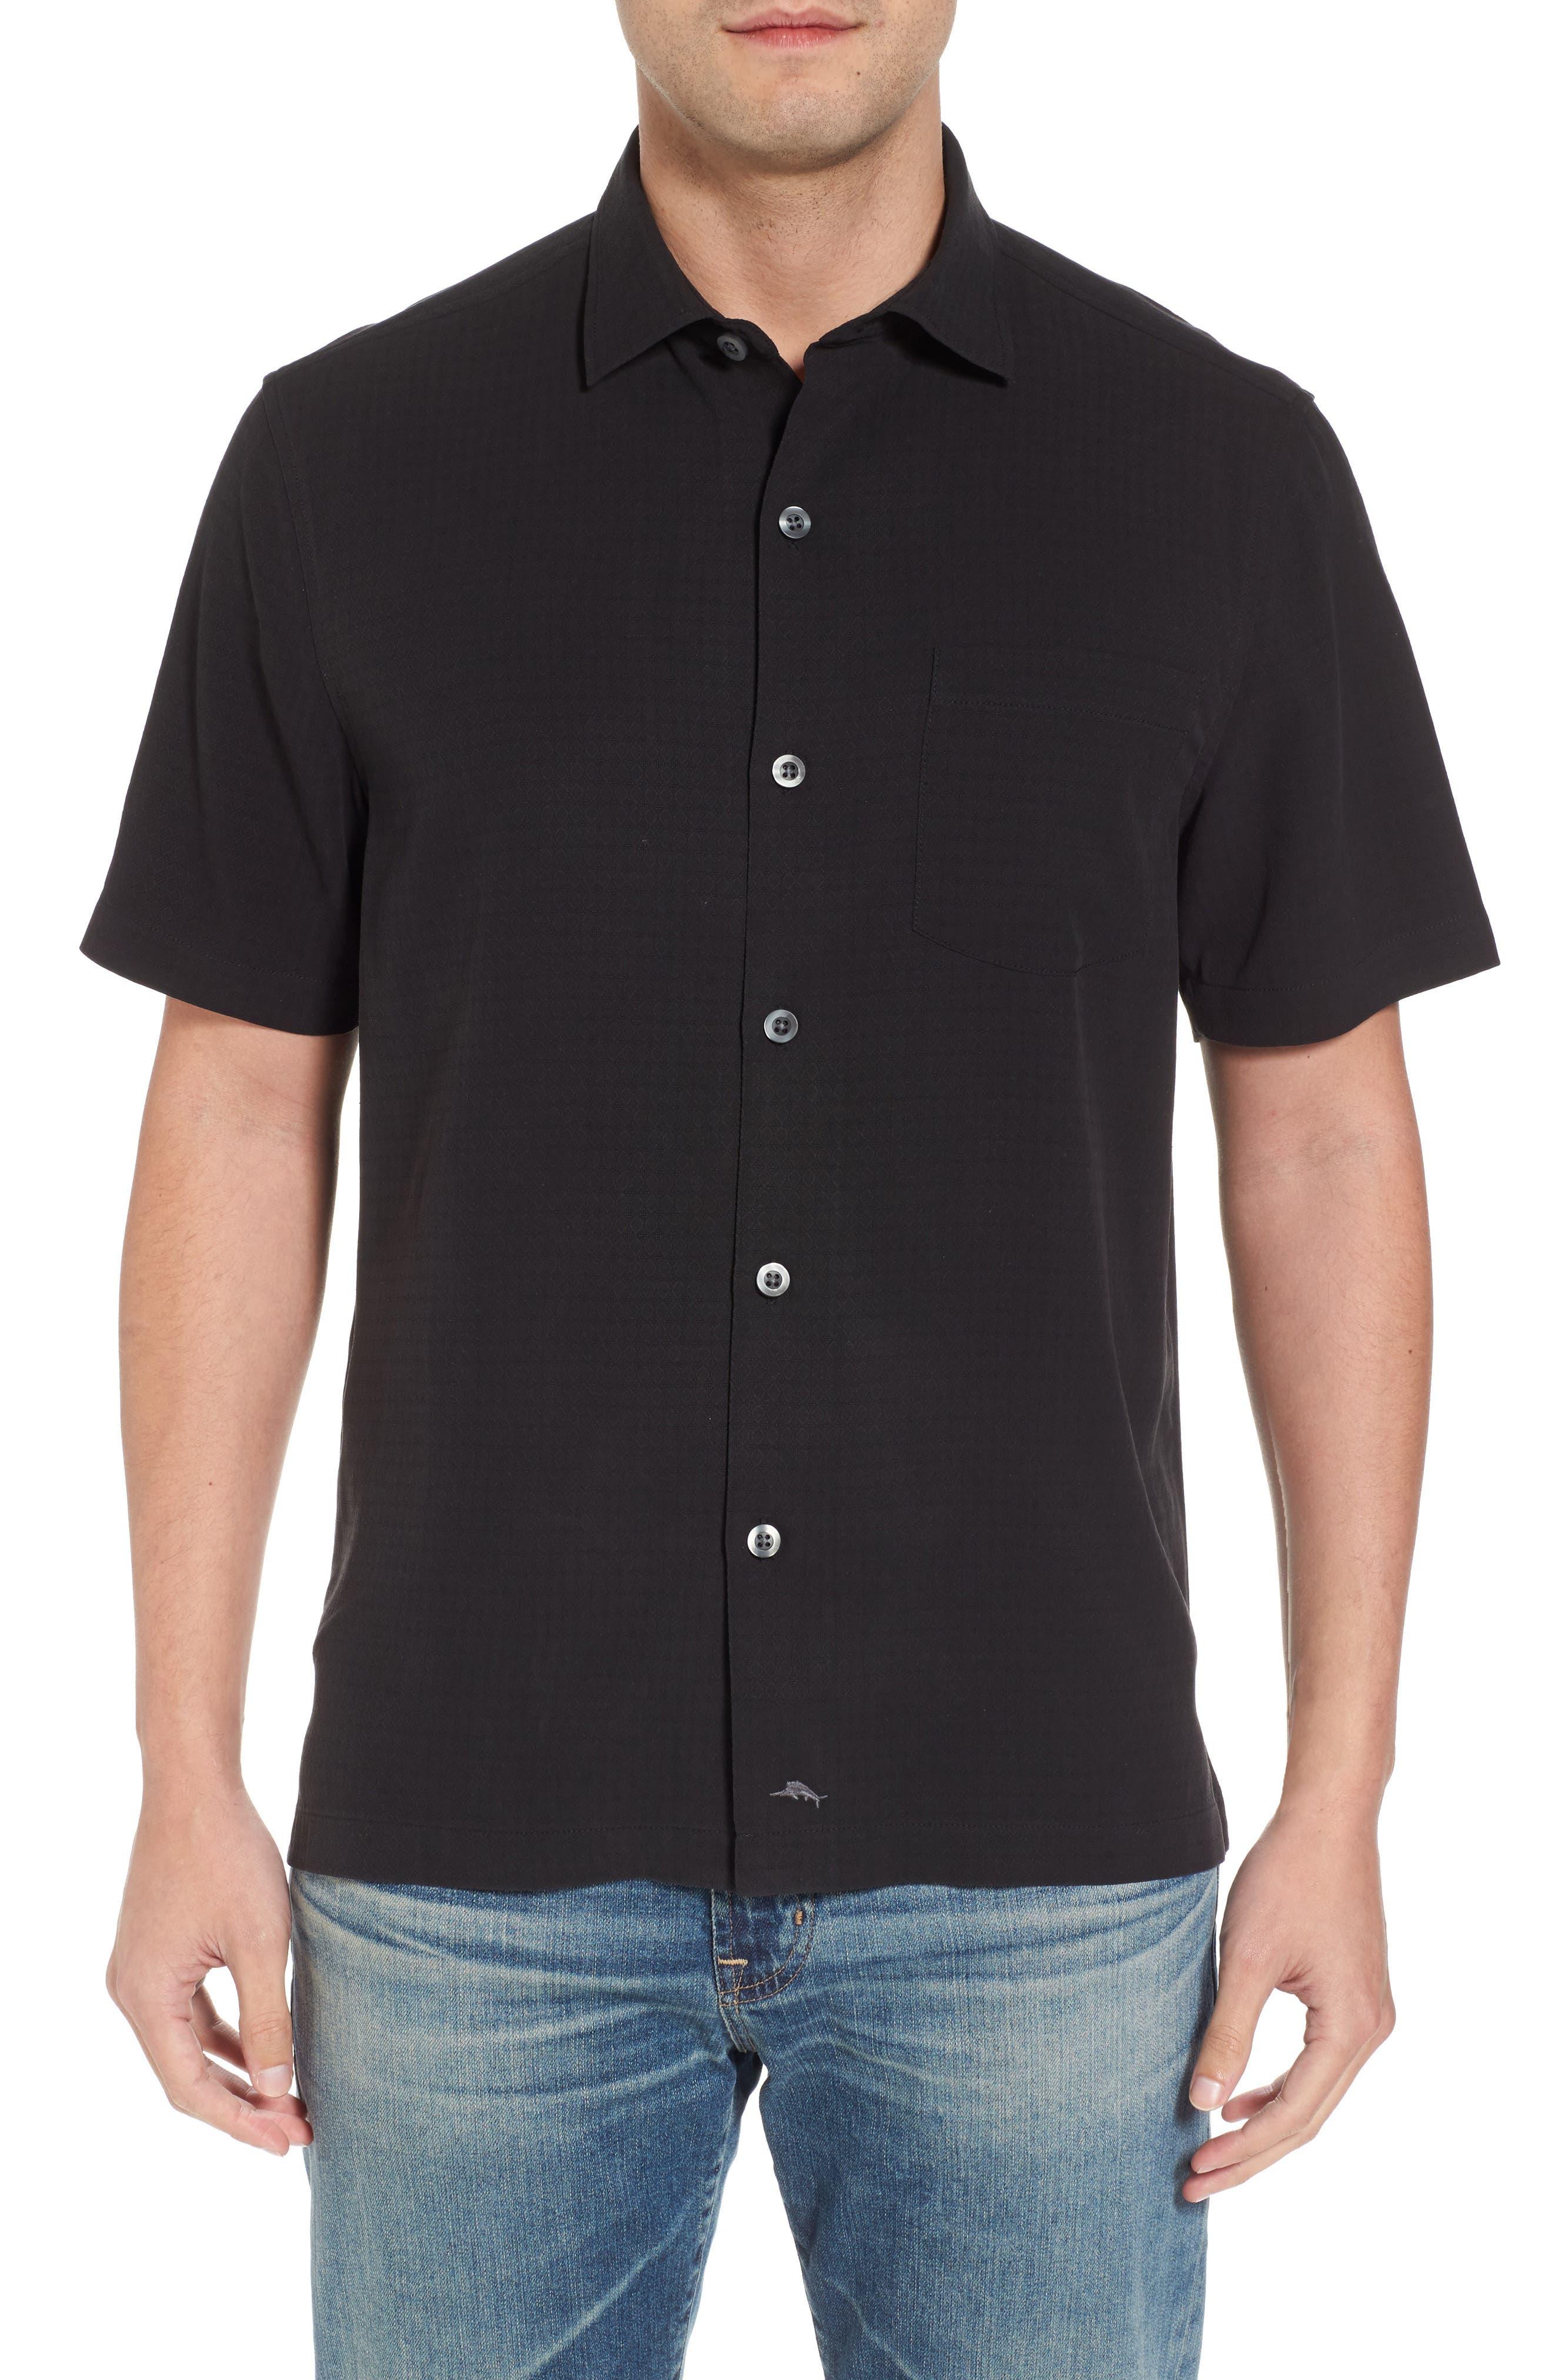 Oasis Jacquard Silk Sport Shirt,                             Main thumbnail 1, color,                             001